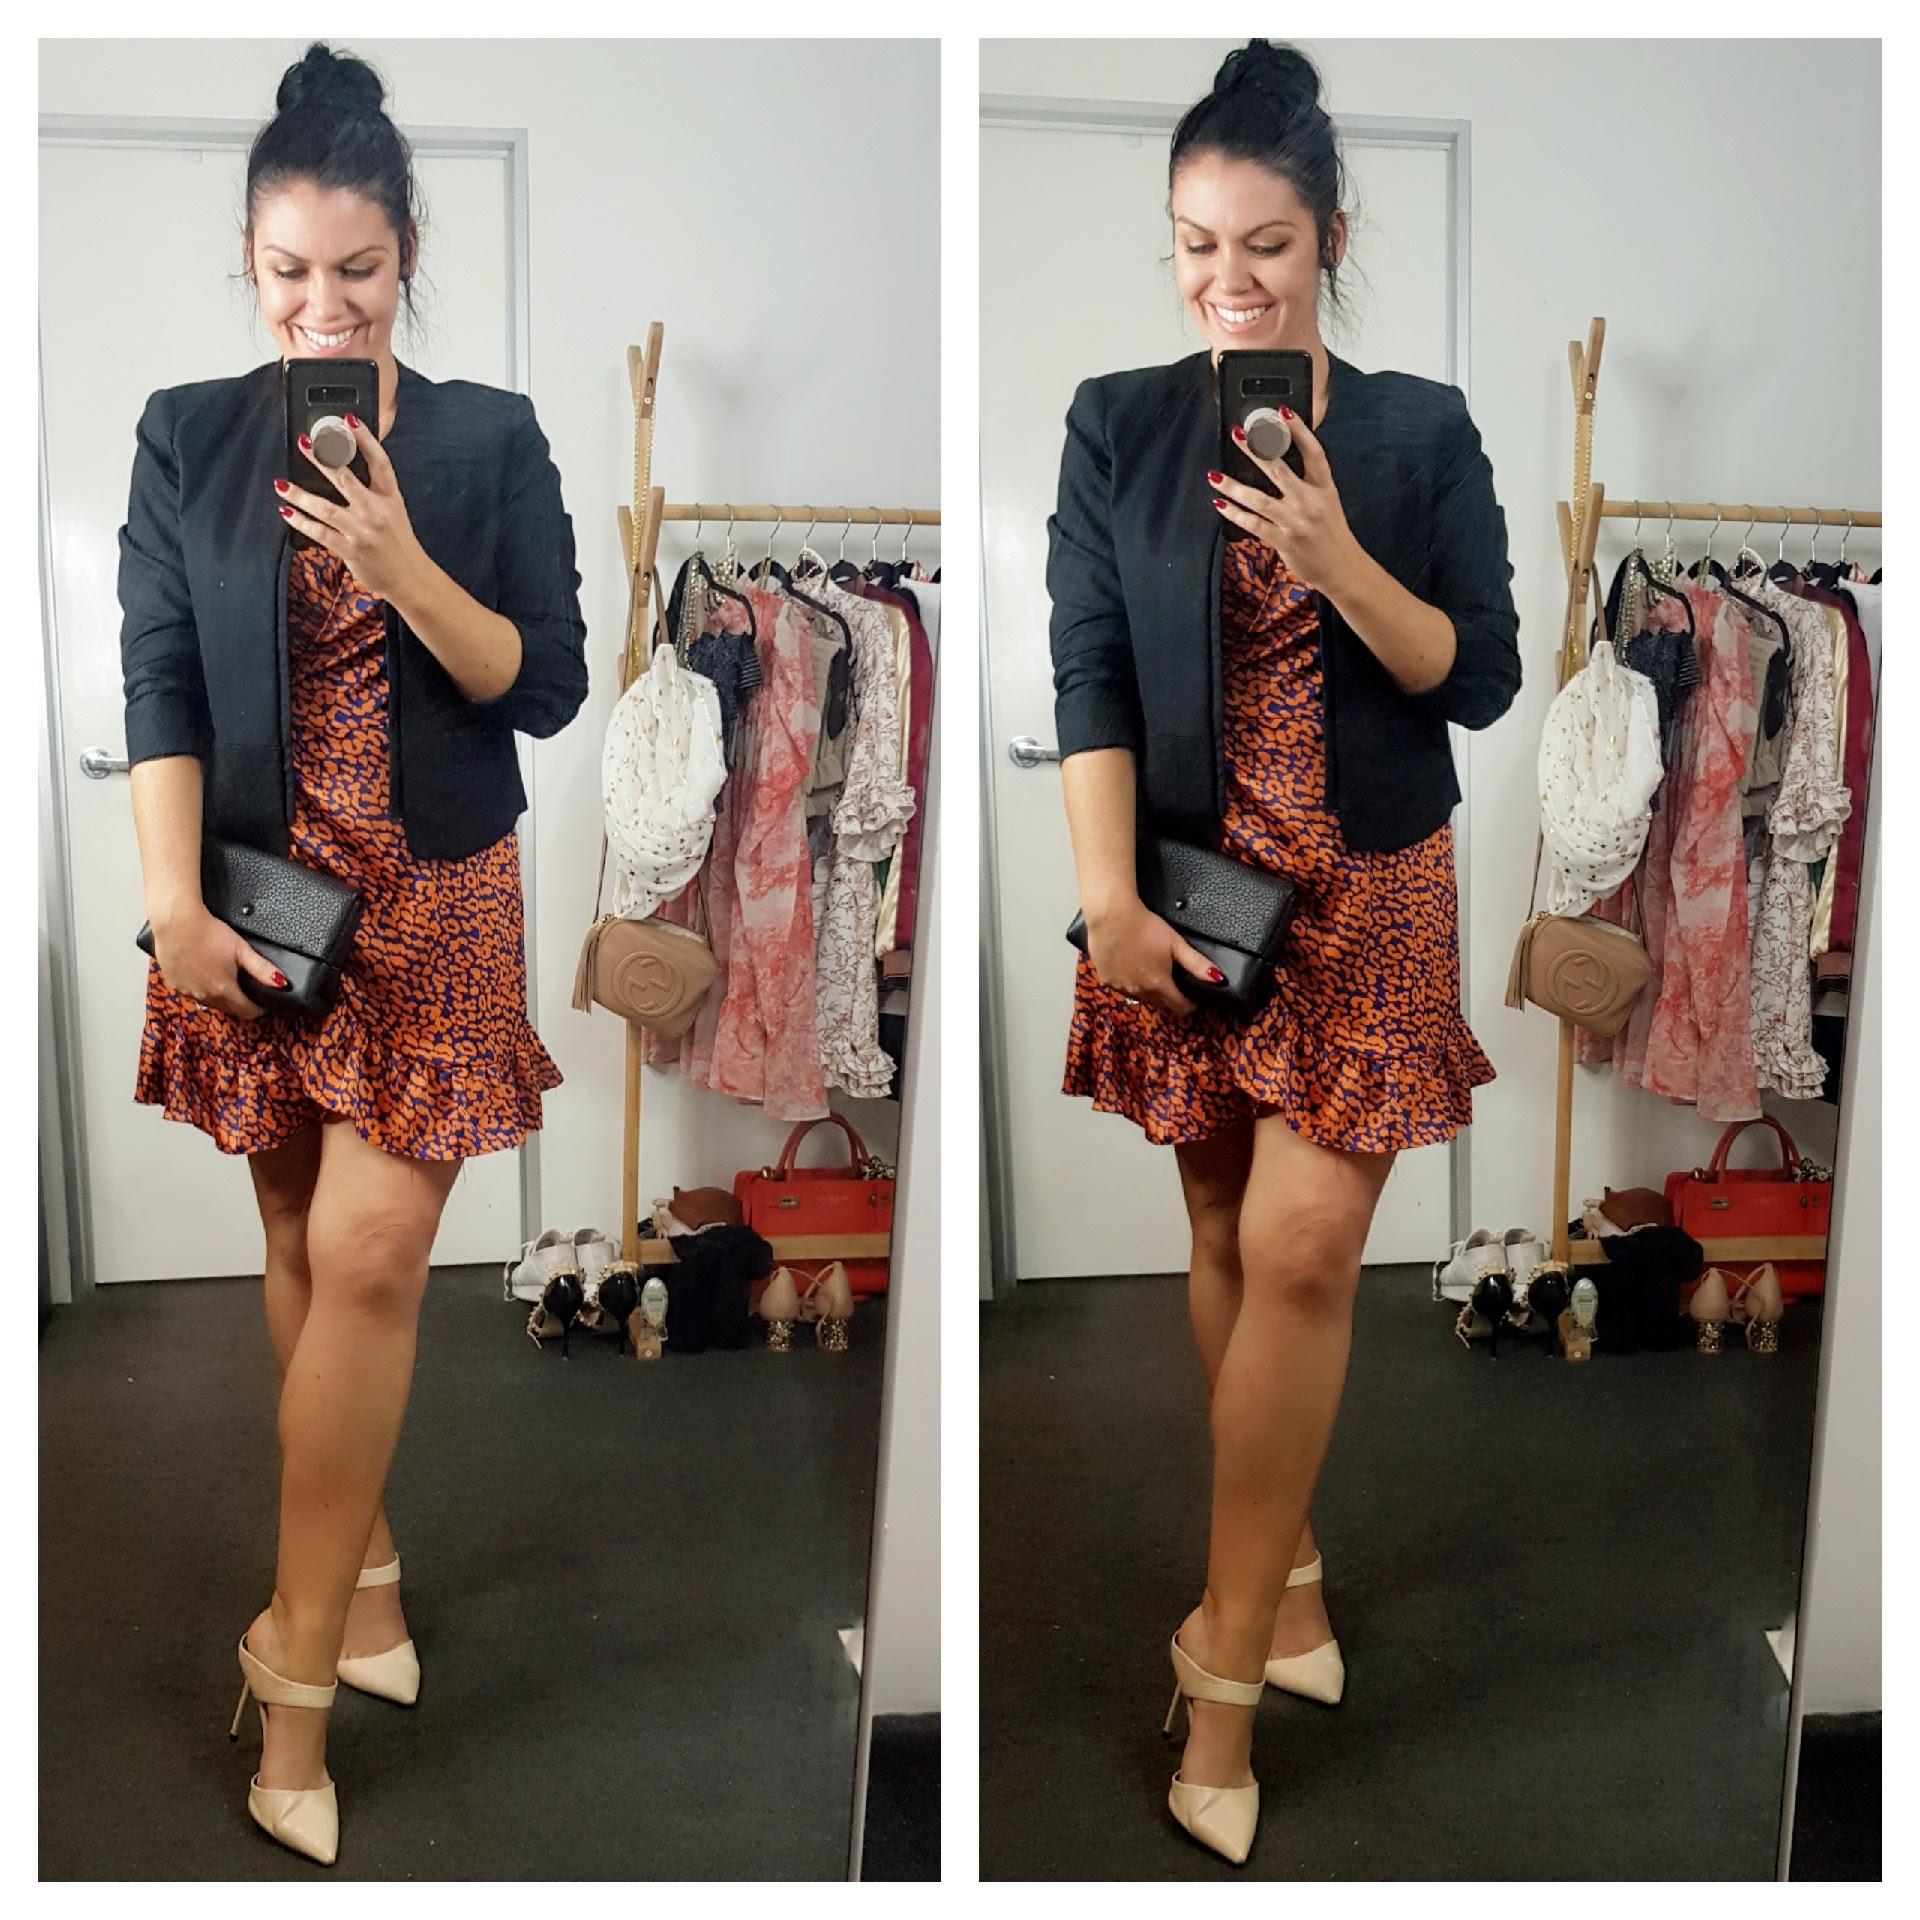 samantha clark waters fashion style ootd blog hi lo leveling up